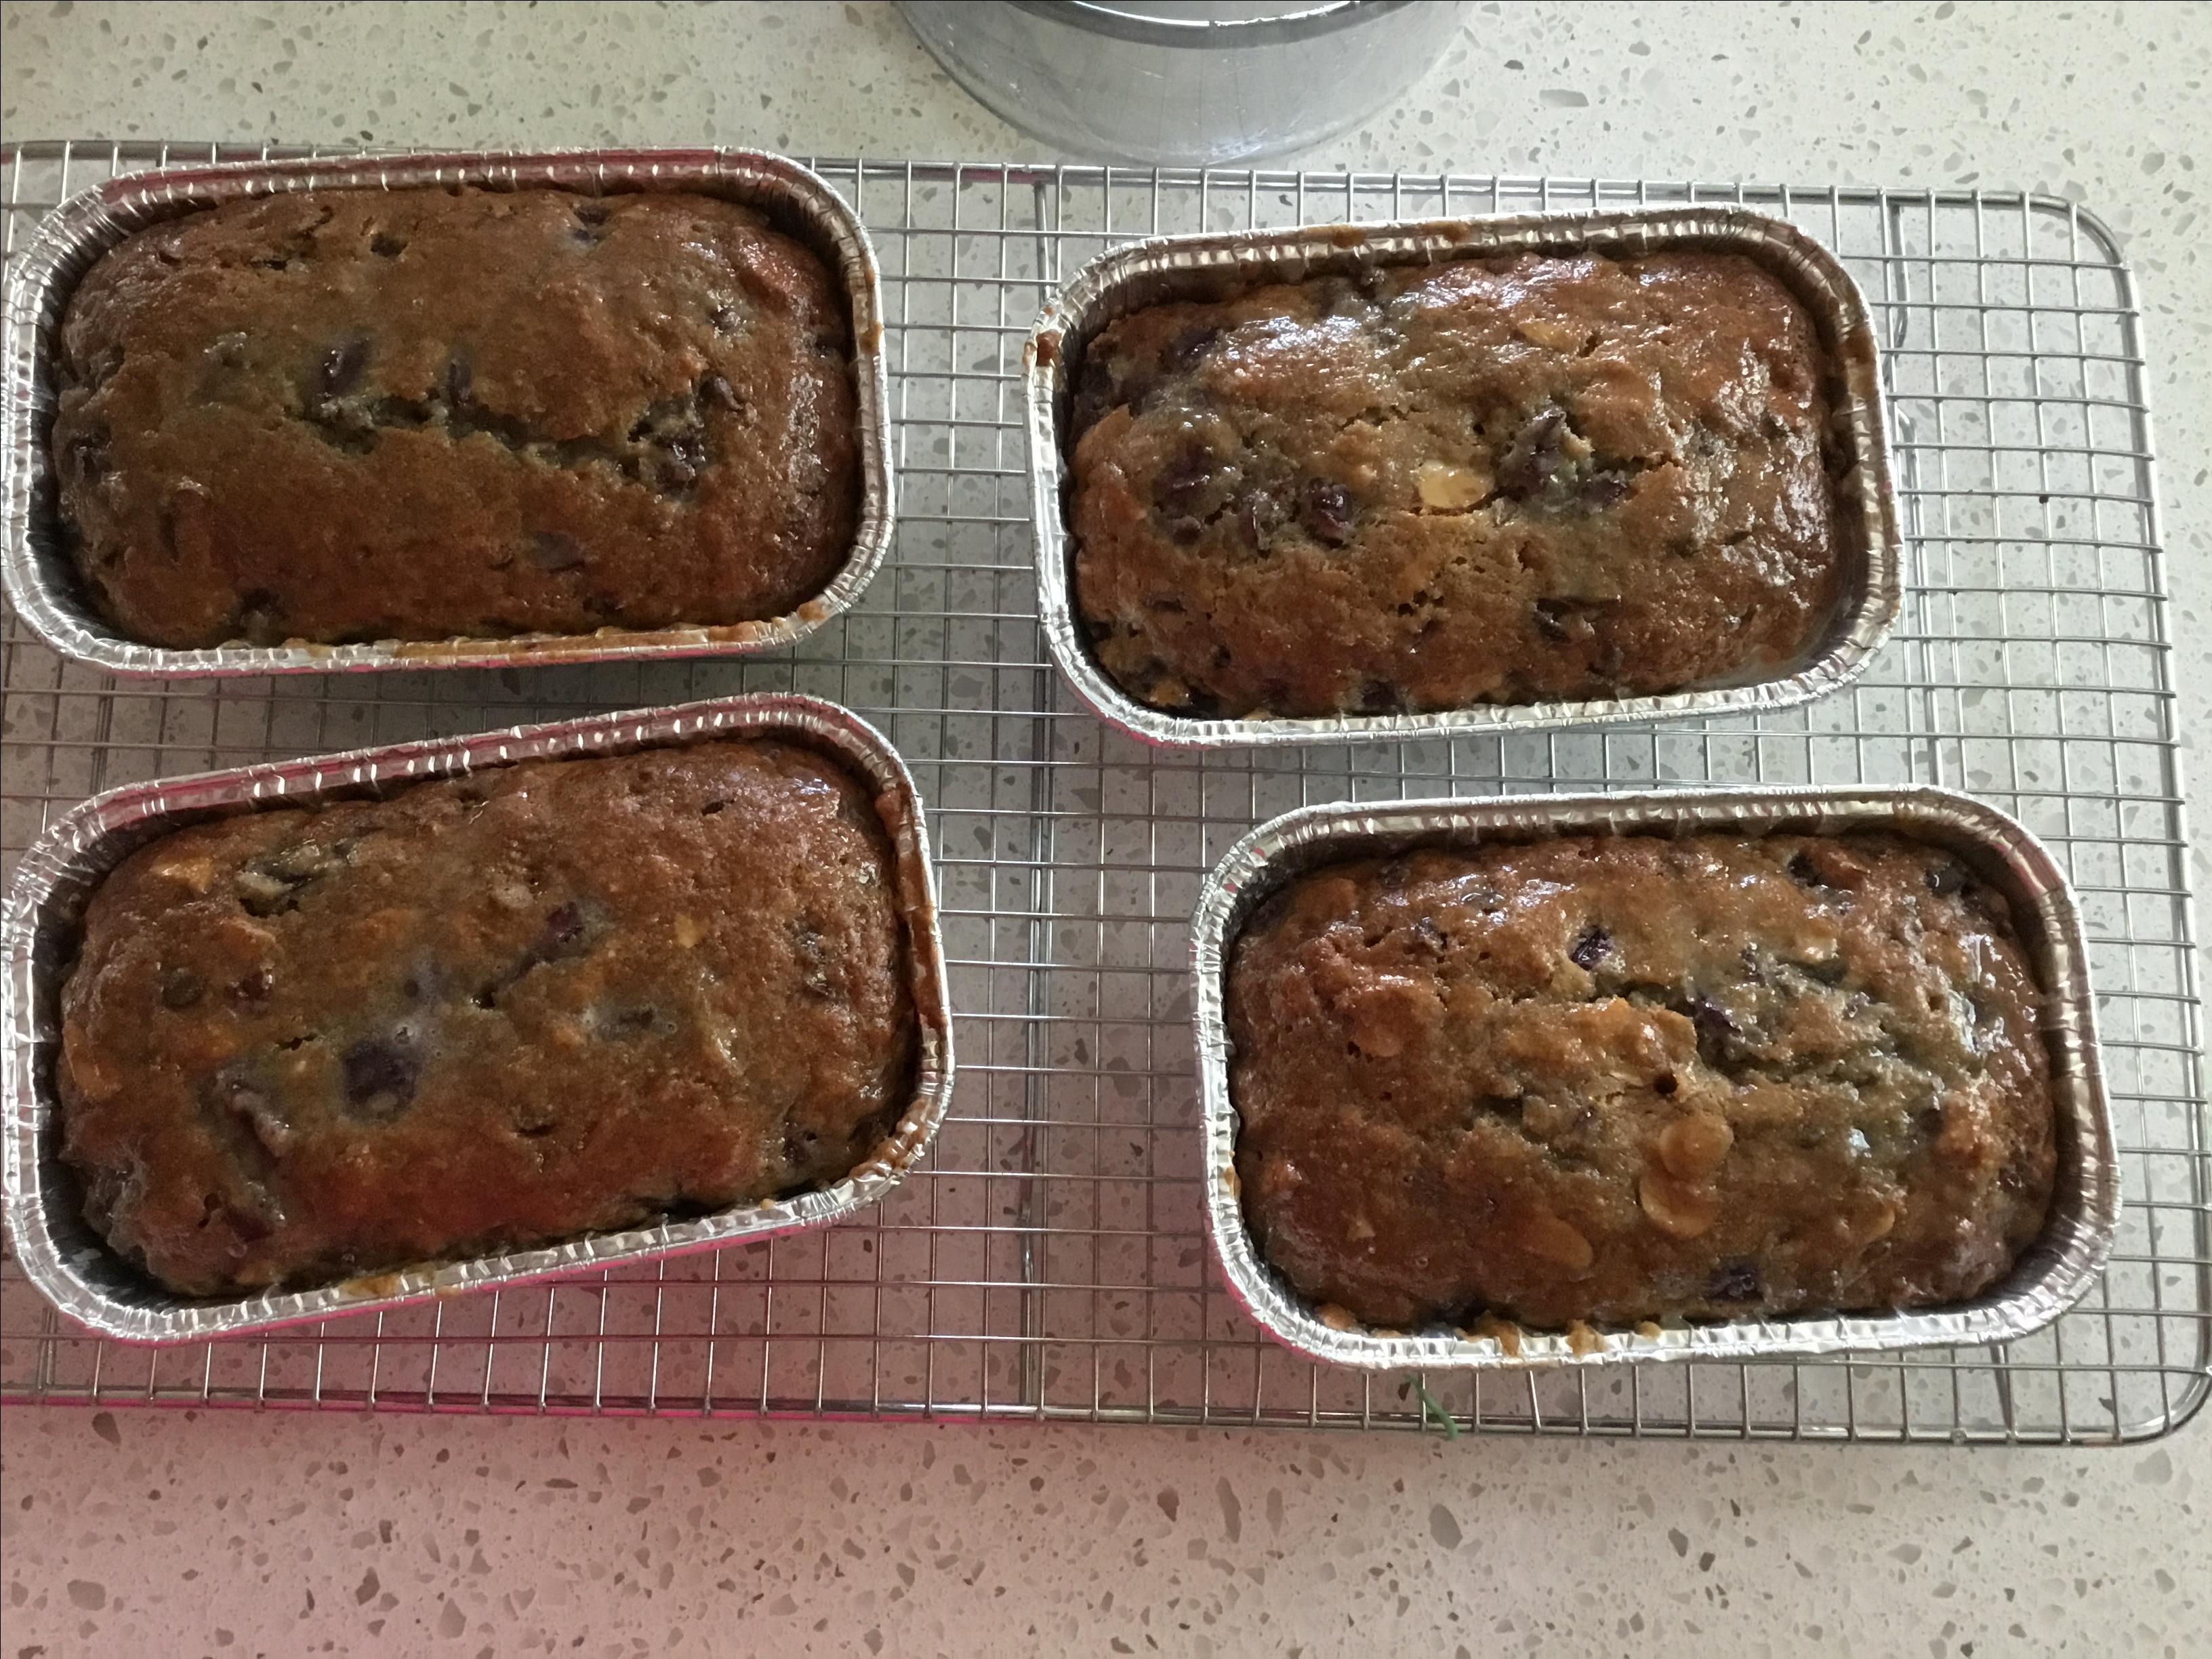 Cherry-Chocolate Loaf patty